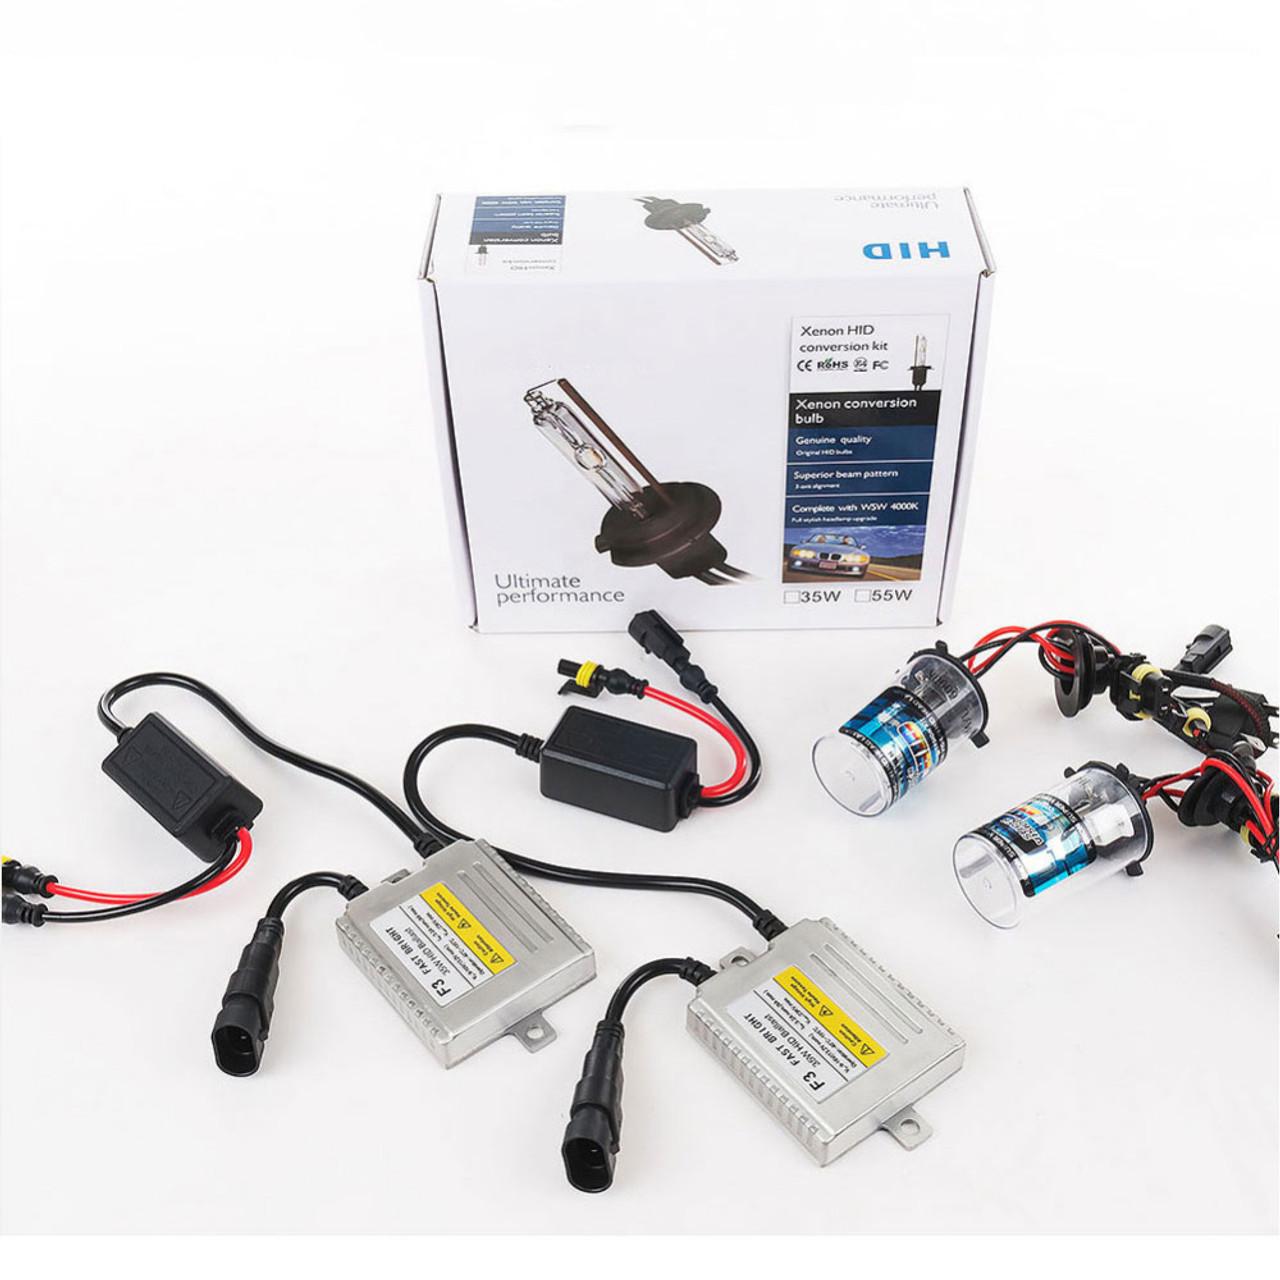 small resolution of  0 1 seconds fast bright h1 xenon f3 ac12v 35w xenon lamp hid kit h3 h1 h4